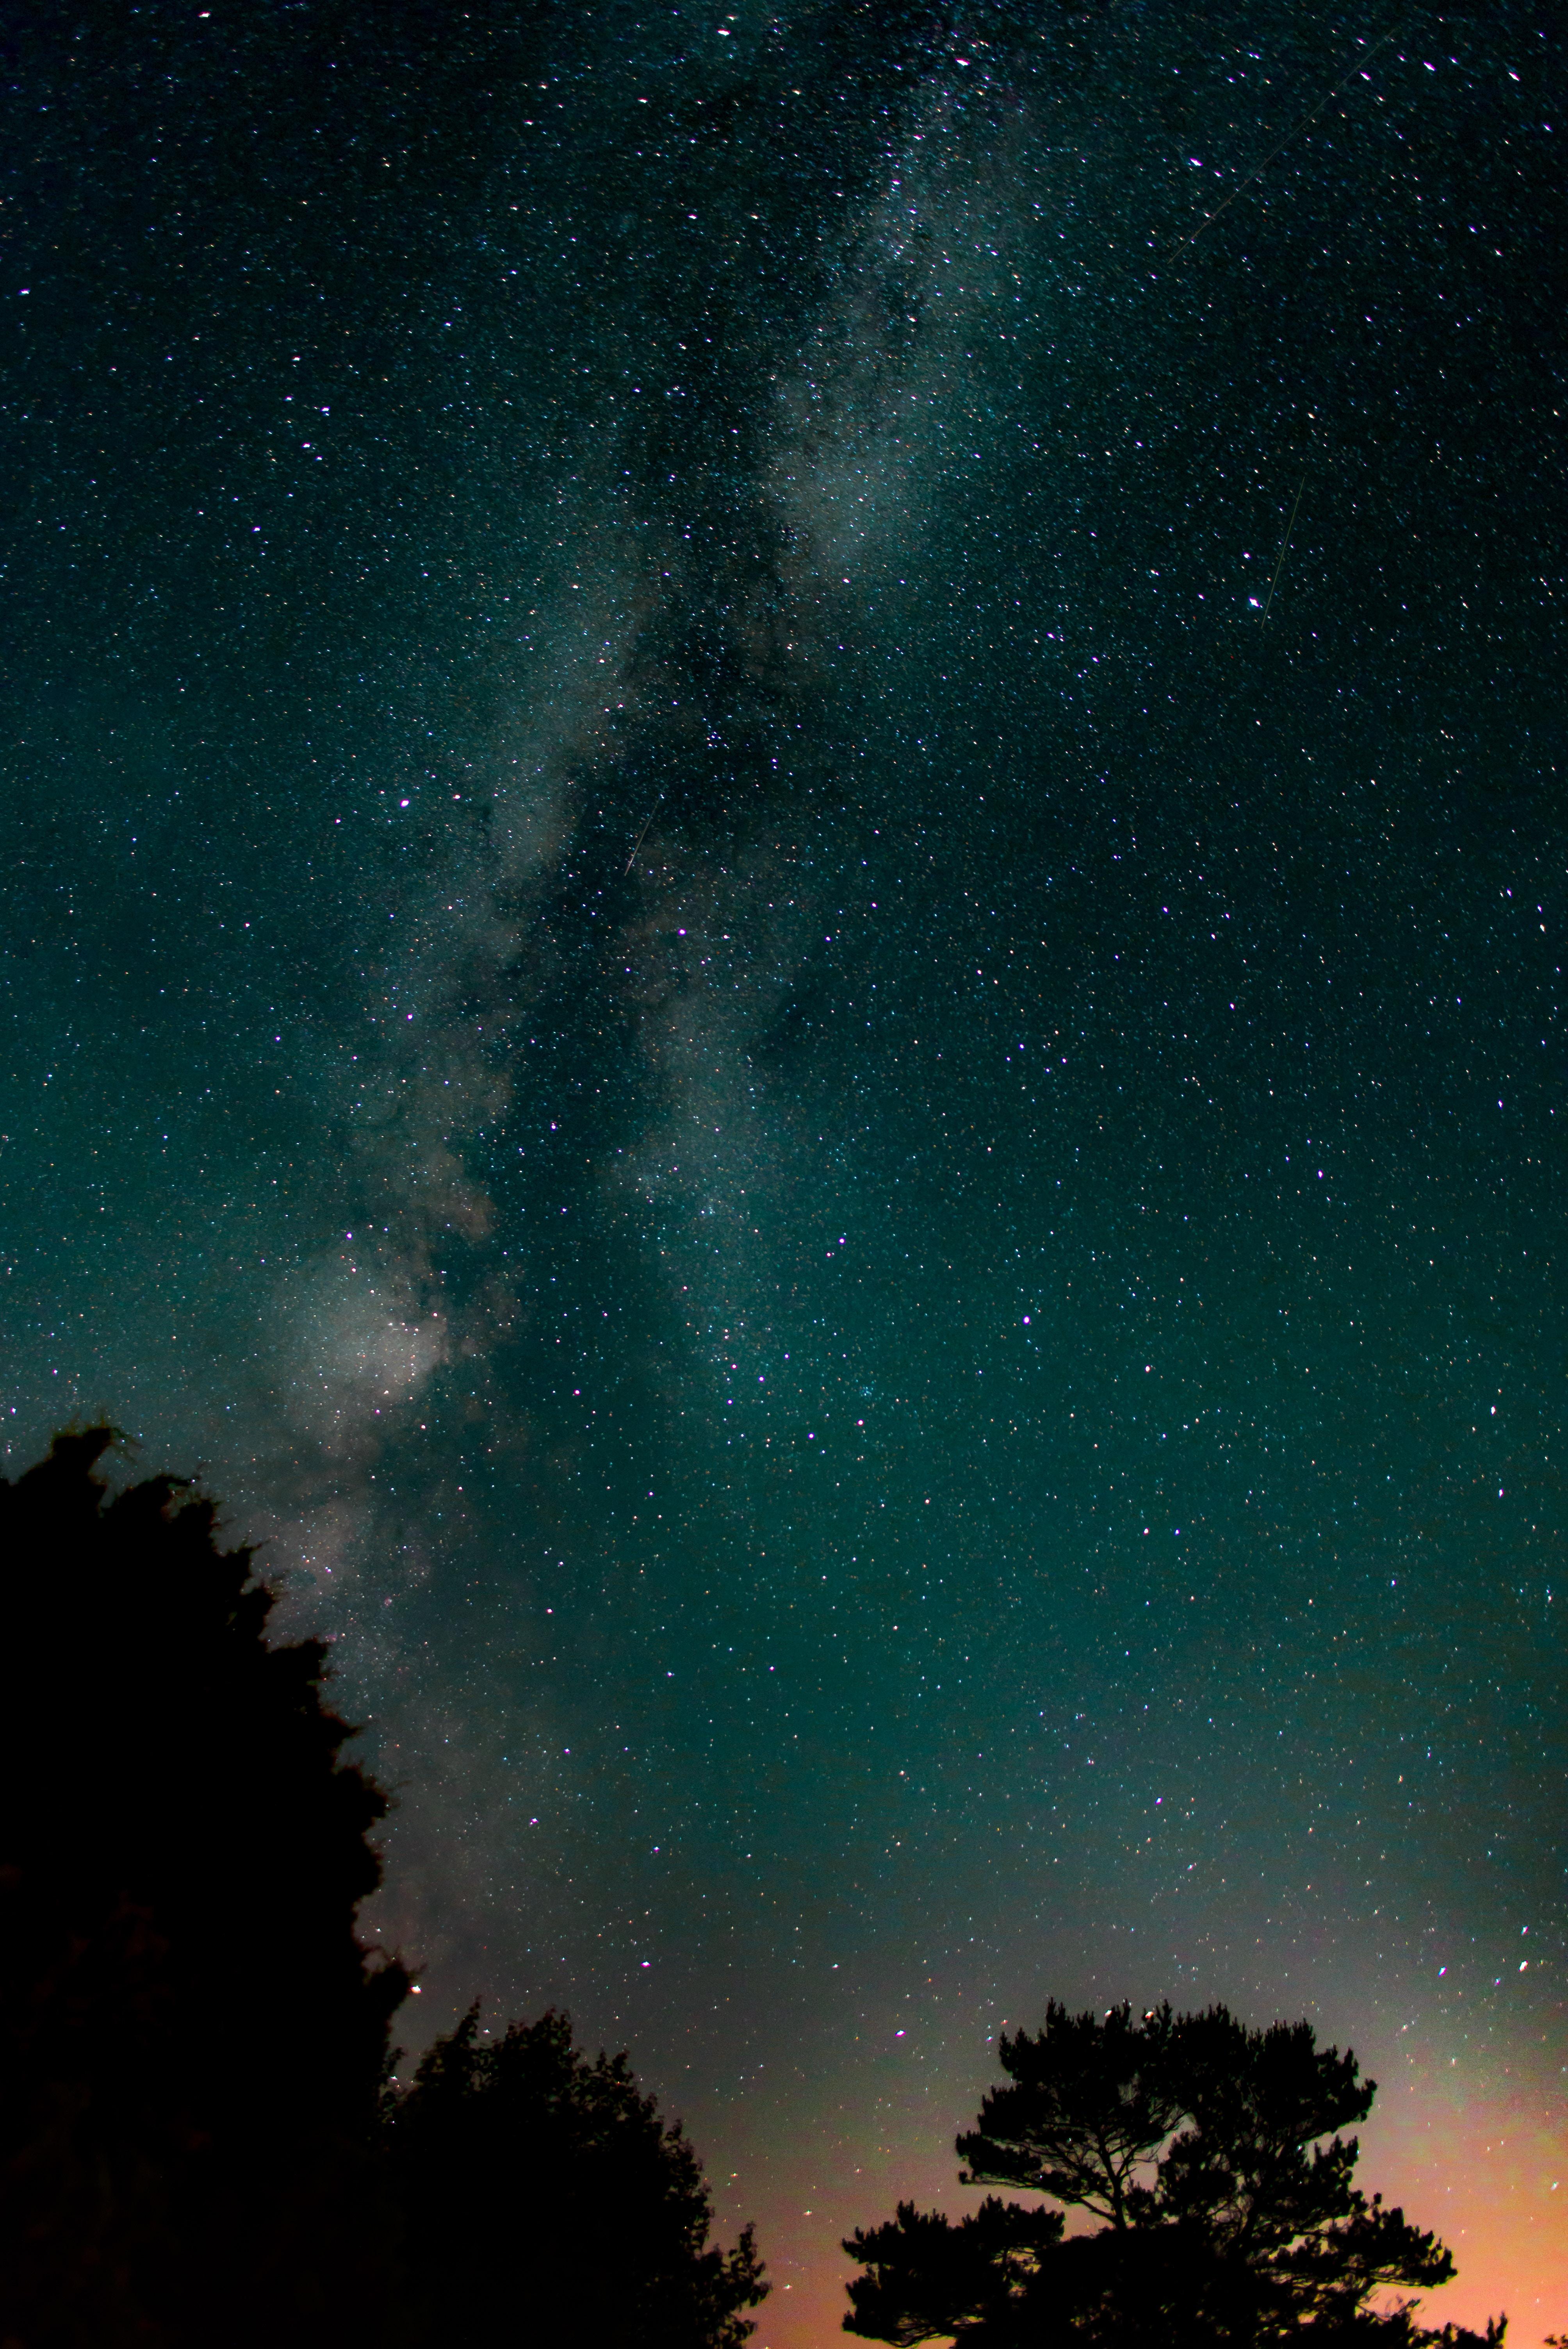 Gambar Pohon Langit Bintang Bima Sakti Suasana Ruang